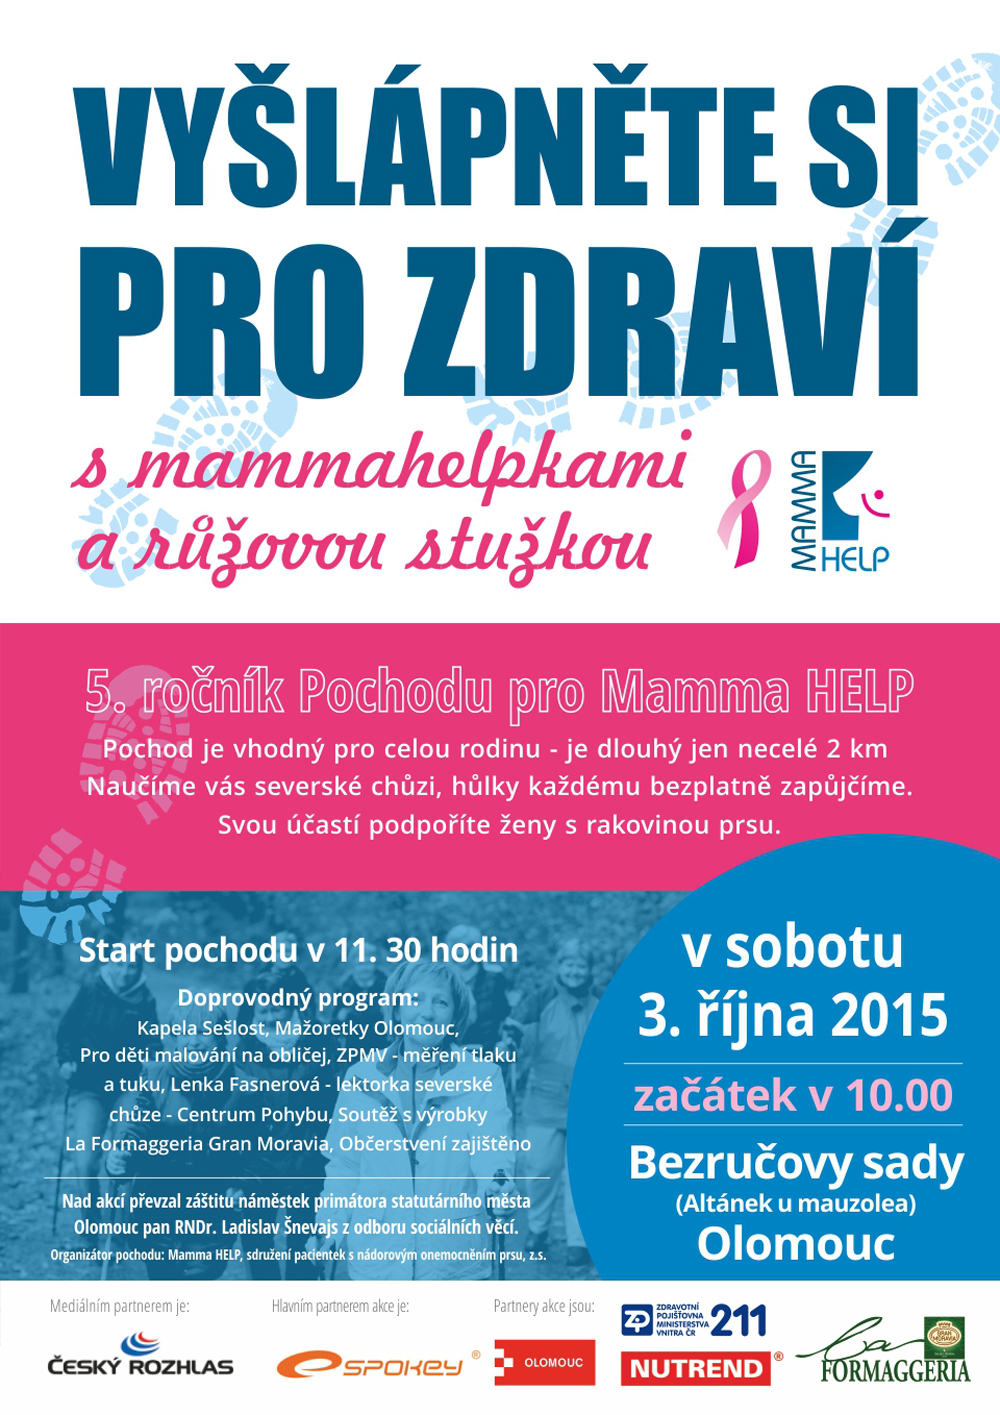 Pochod pro Mamma HELP v Olomouci